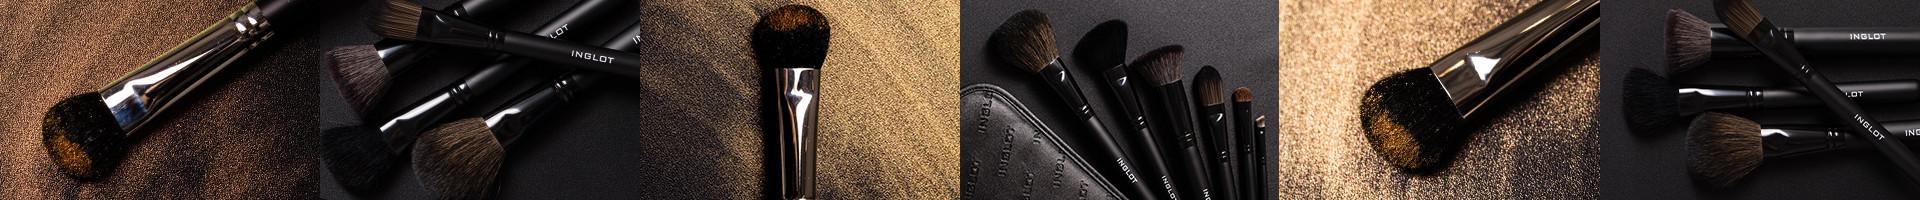 Pigments Brushes